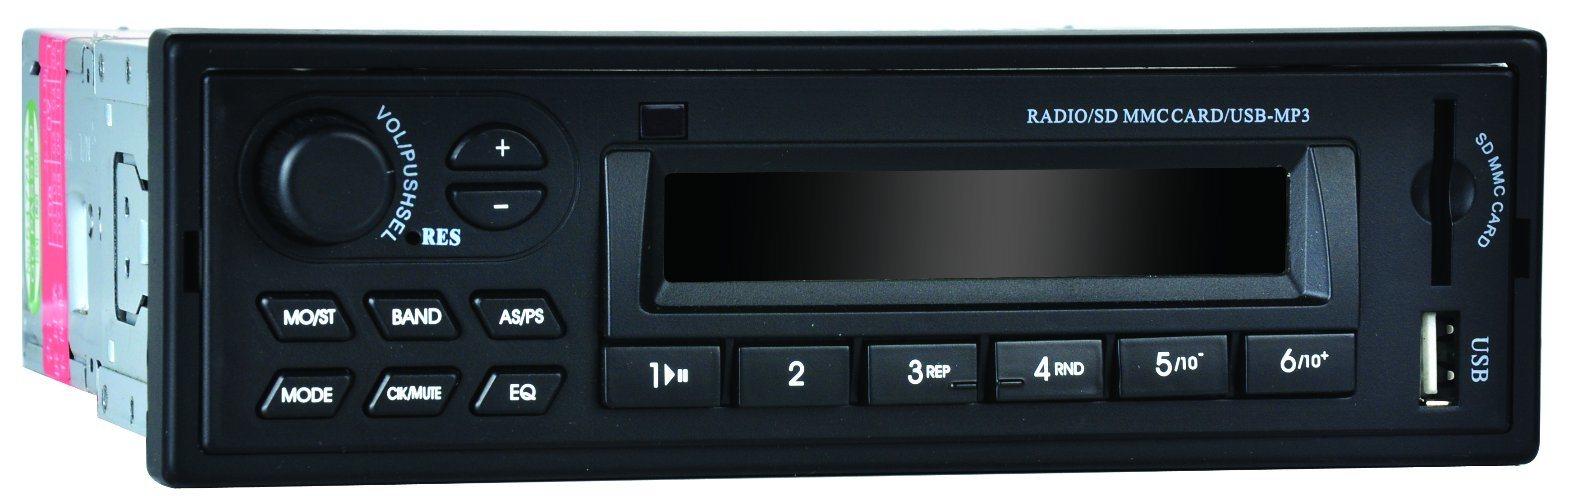 China Instructions Car Mp3 Player Fm Transmitter Usb China Car